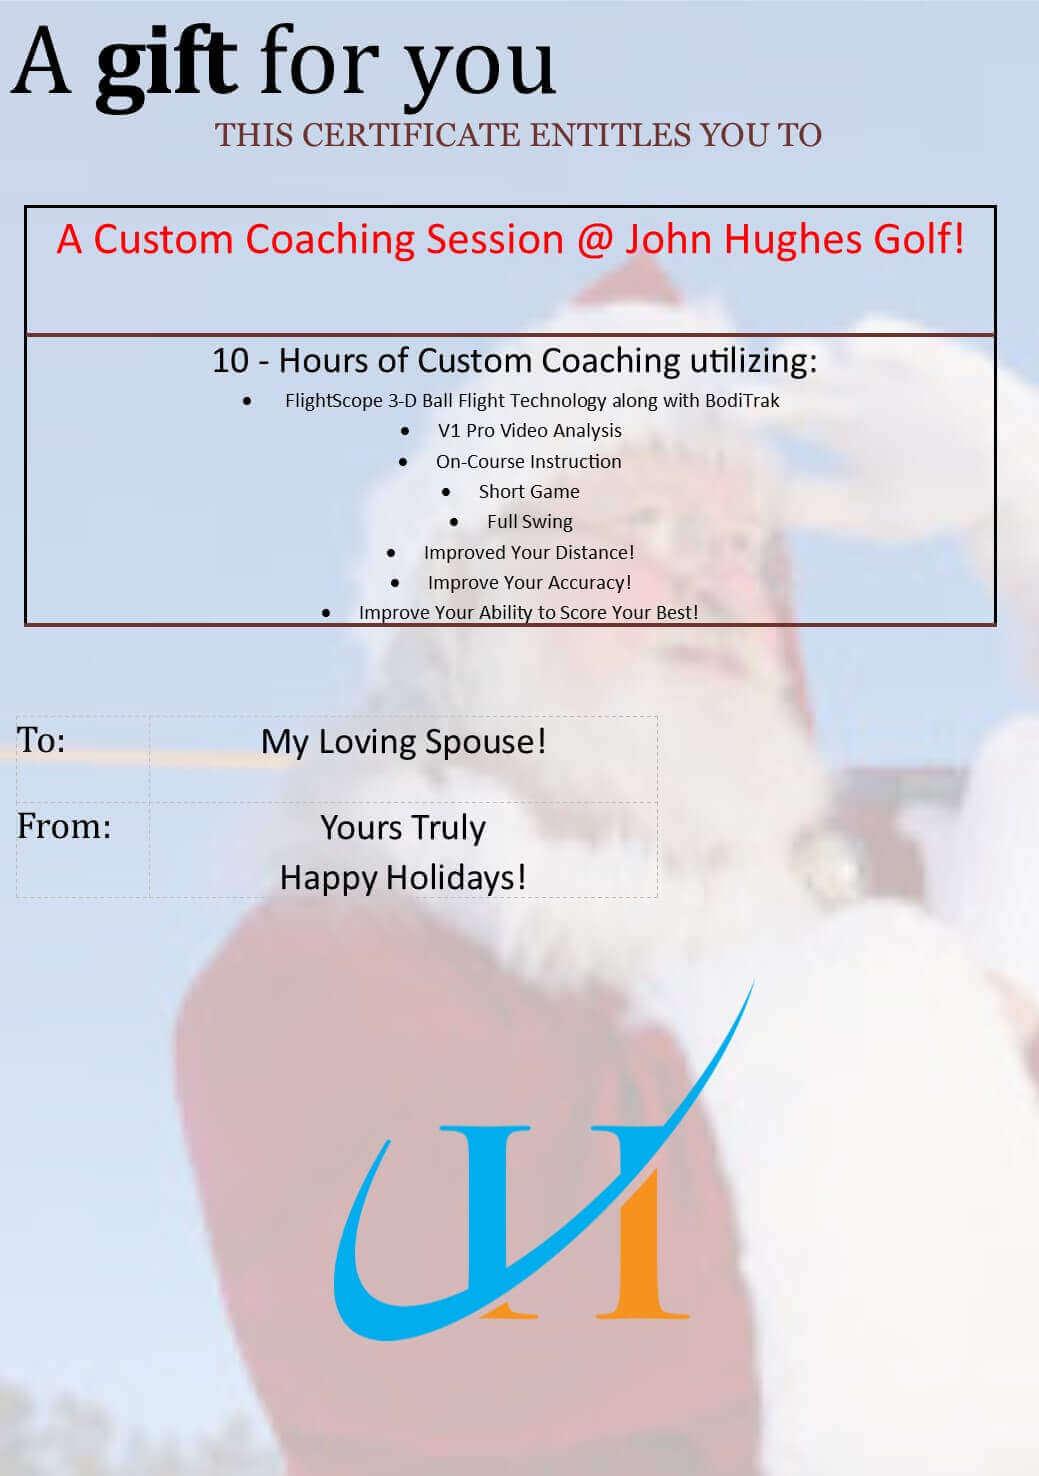 Holiday Gift Certificates - 25% Off, John Hughes Golf, Orlando Golf Lessons, Orlando Golf Schools, Best Orlando Junior Golf Lessons, Best Orlando Junior Golf Schools, Best Orlando Ladies Golf Lessons